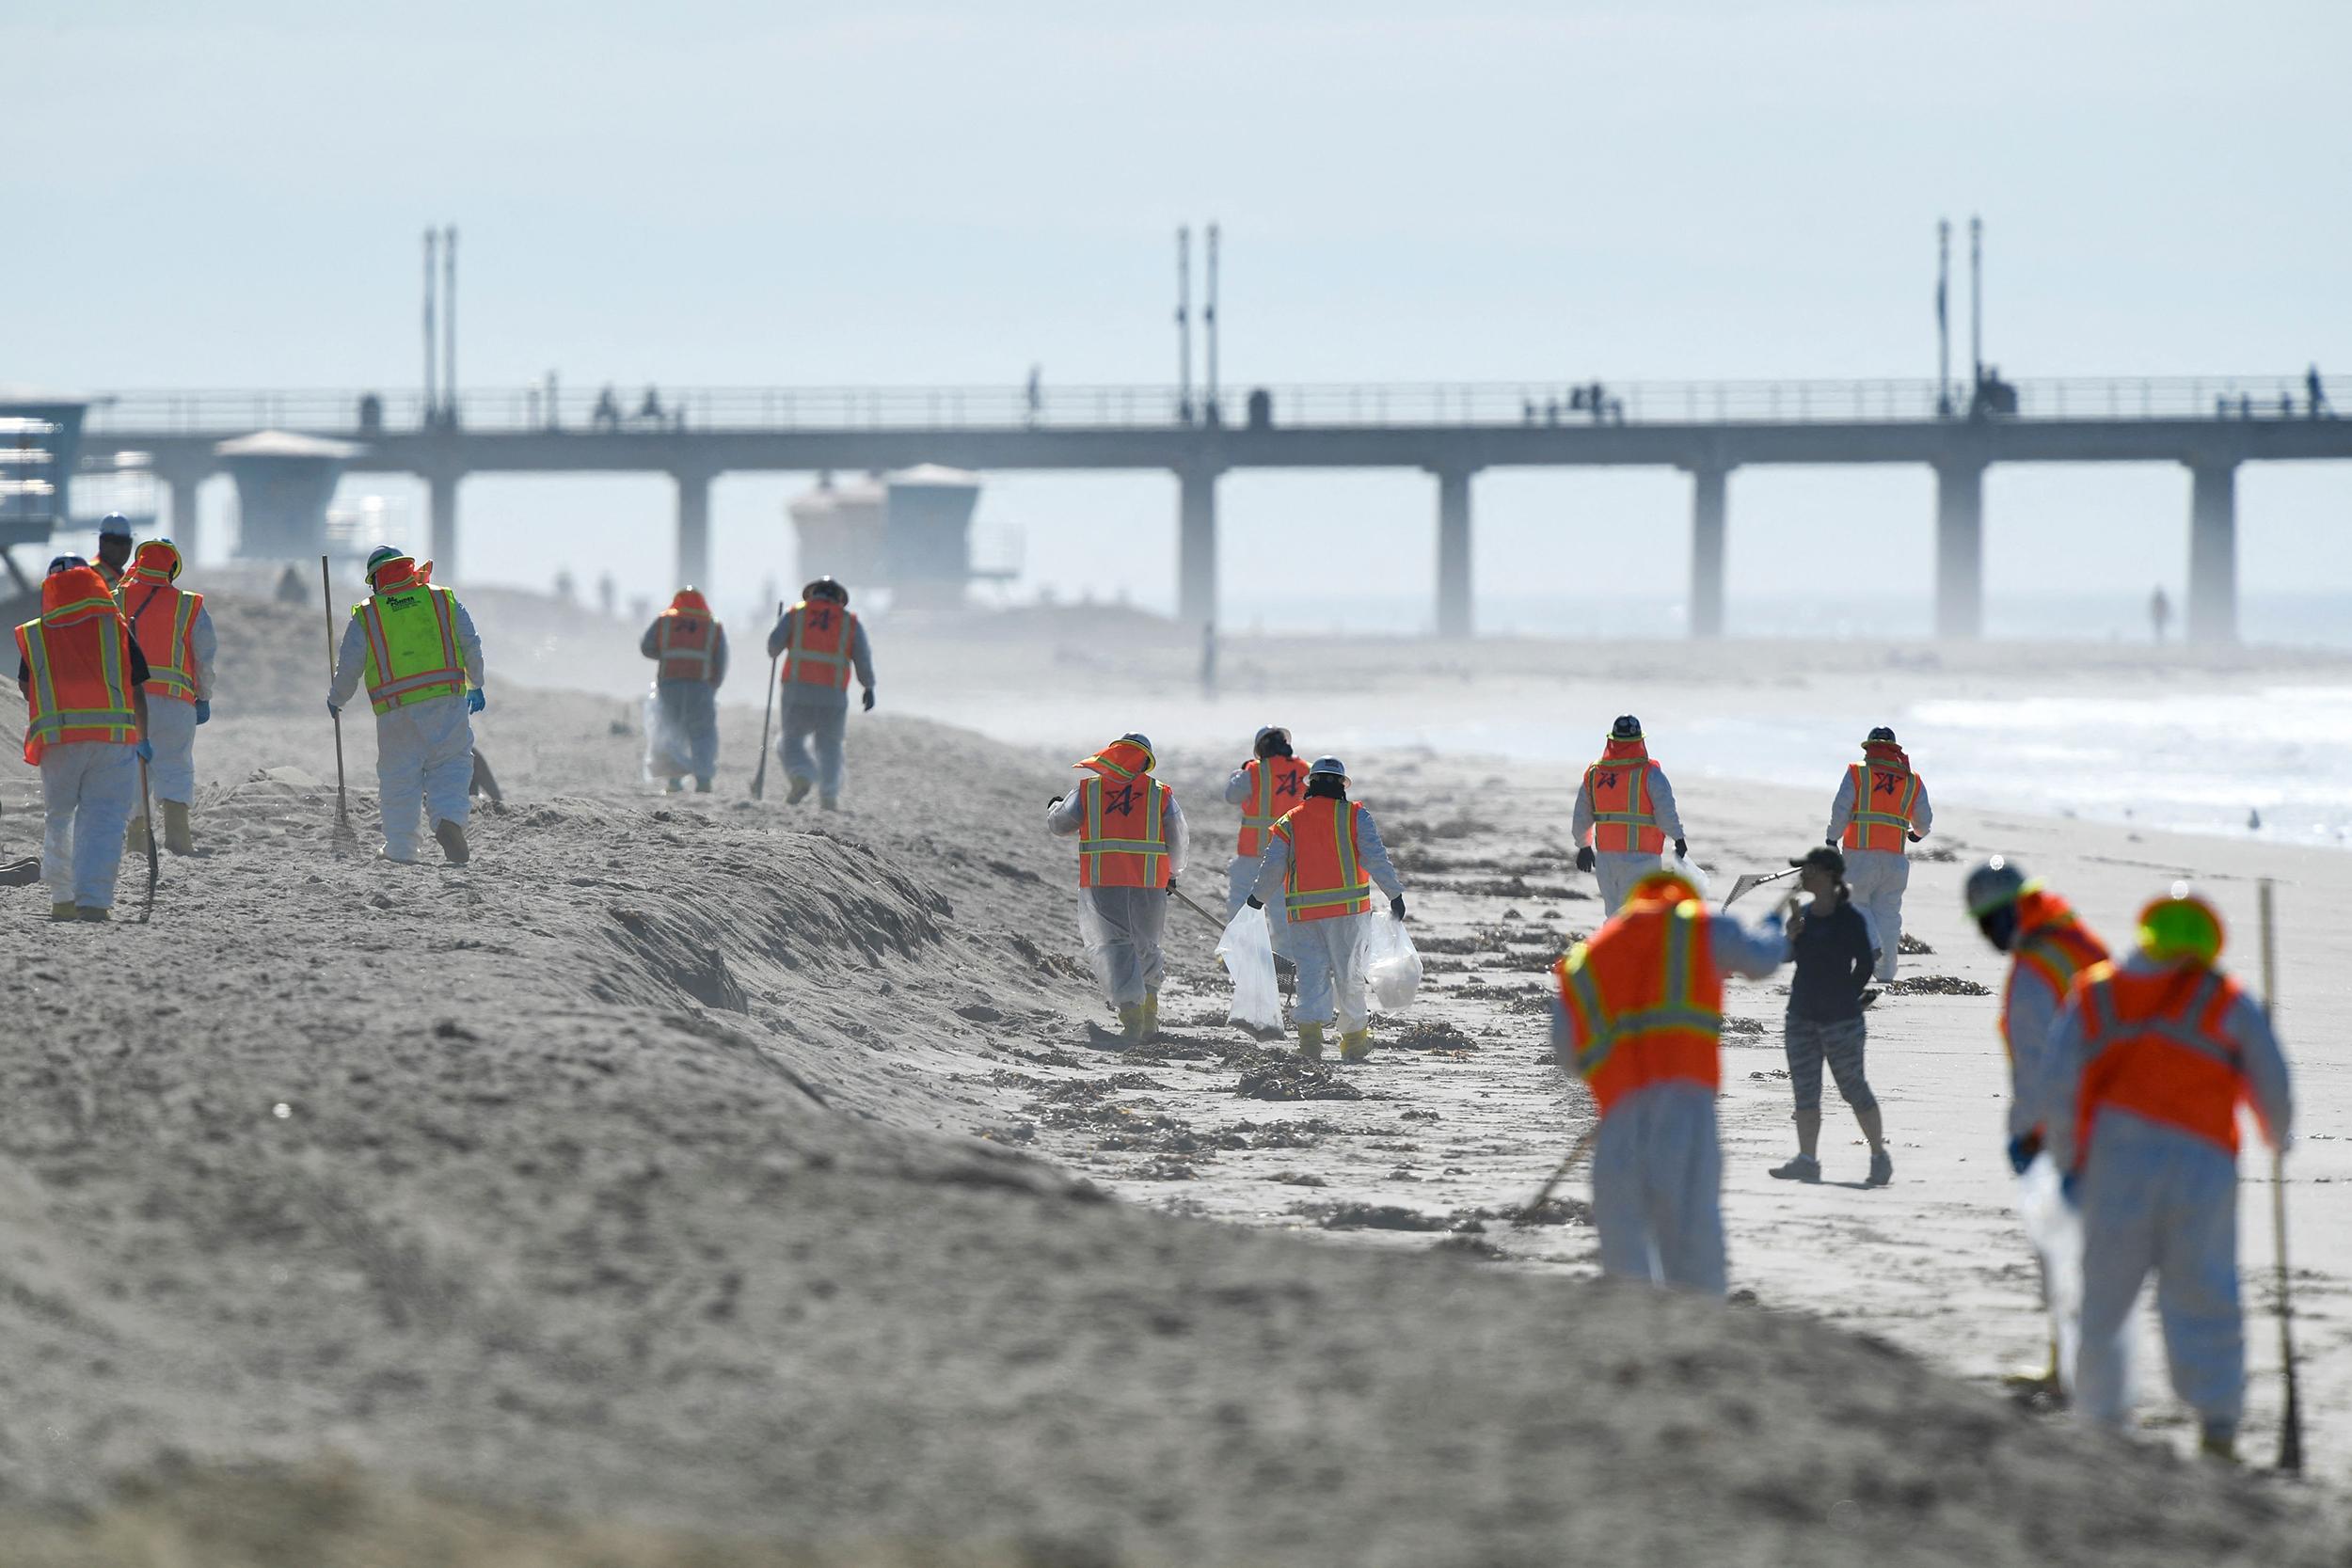 Operator in California oil spill didn't shut down for hours after leak alert, regulators say